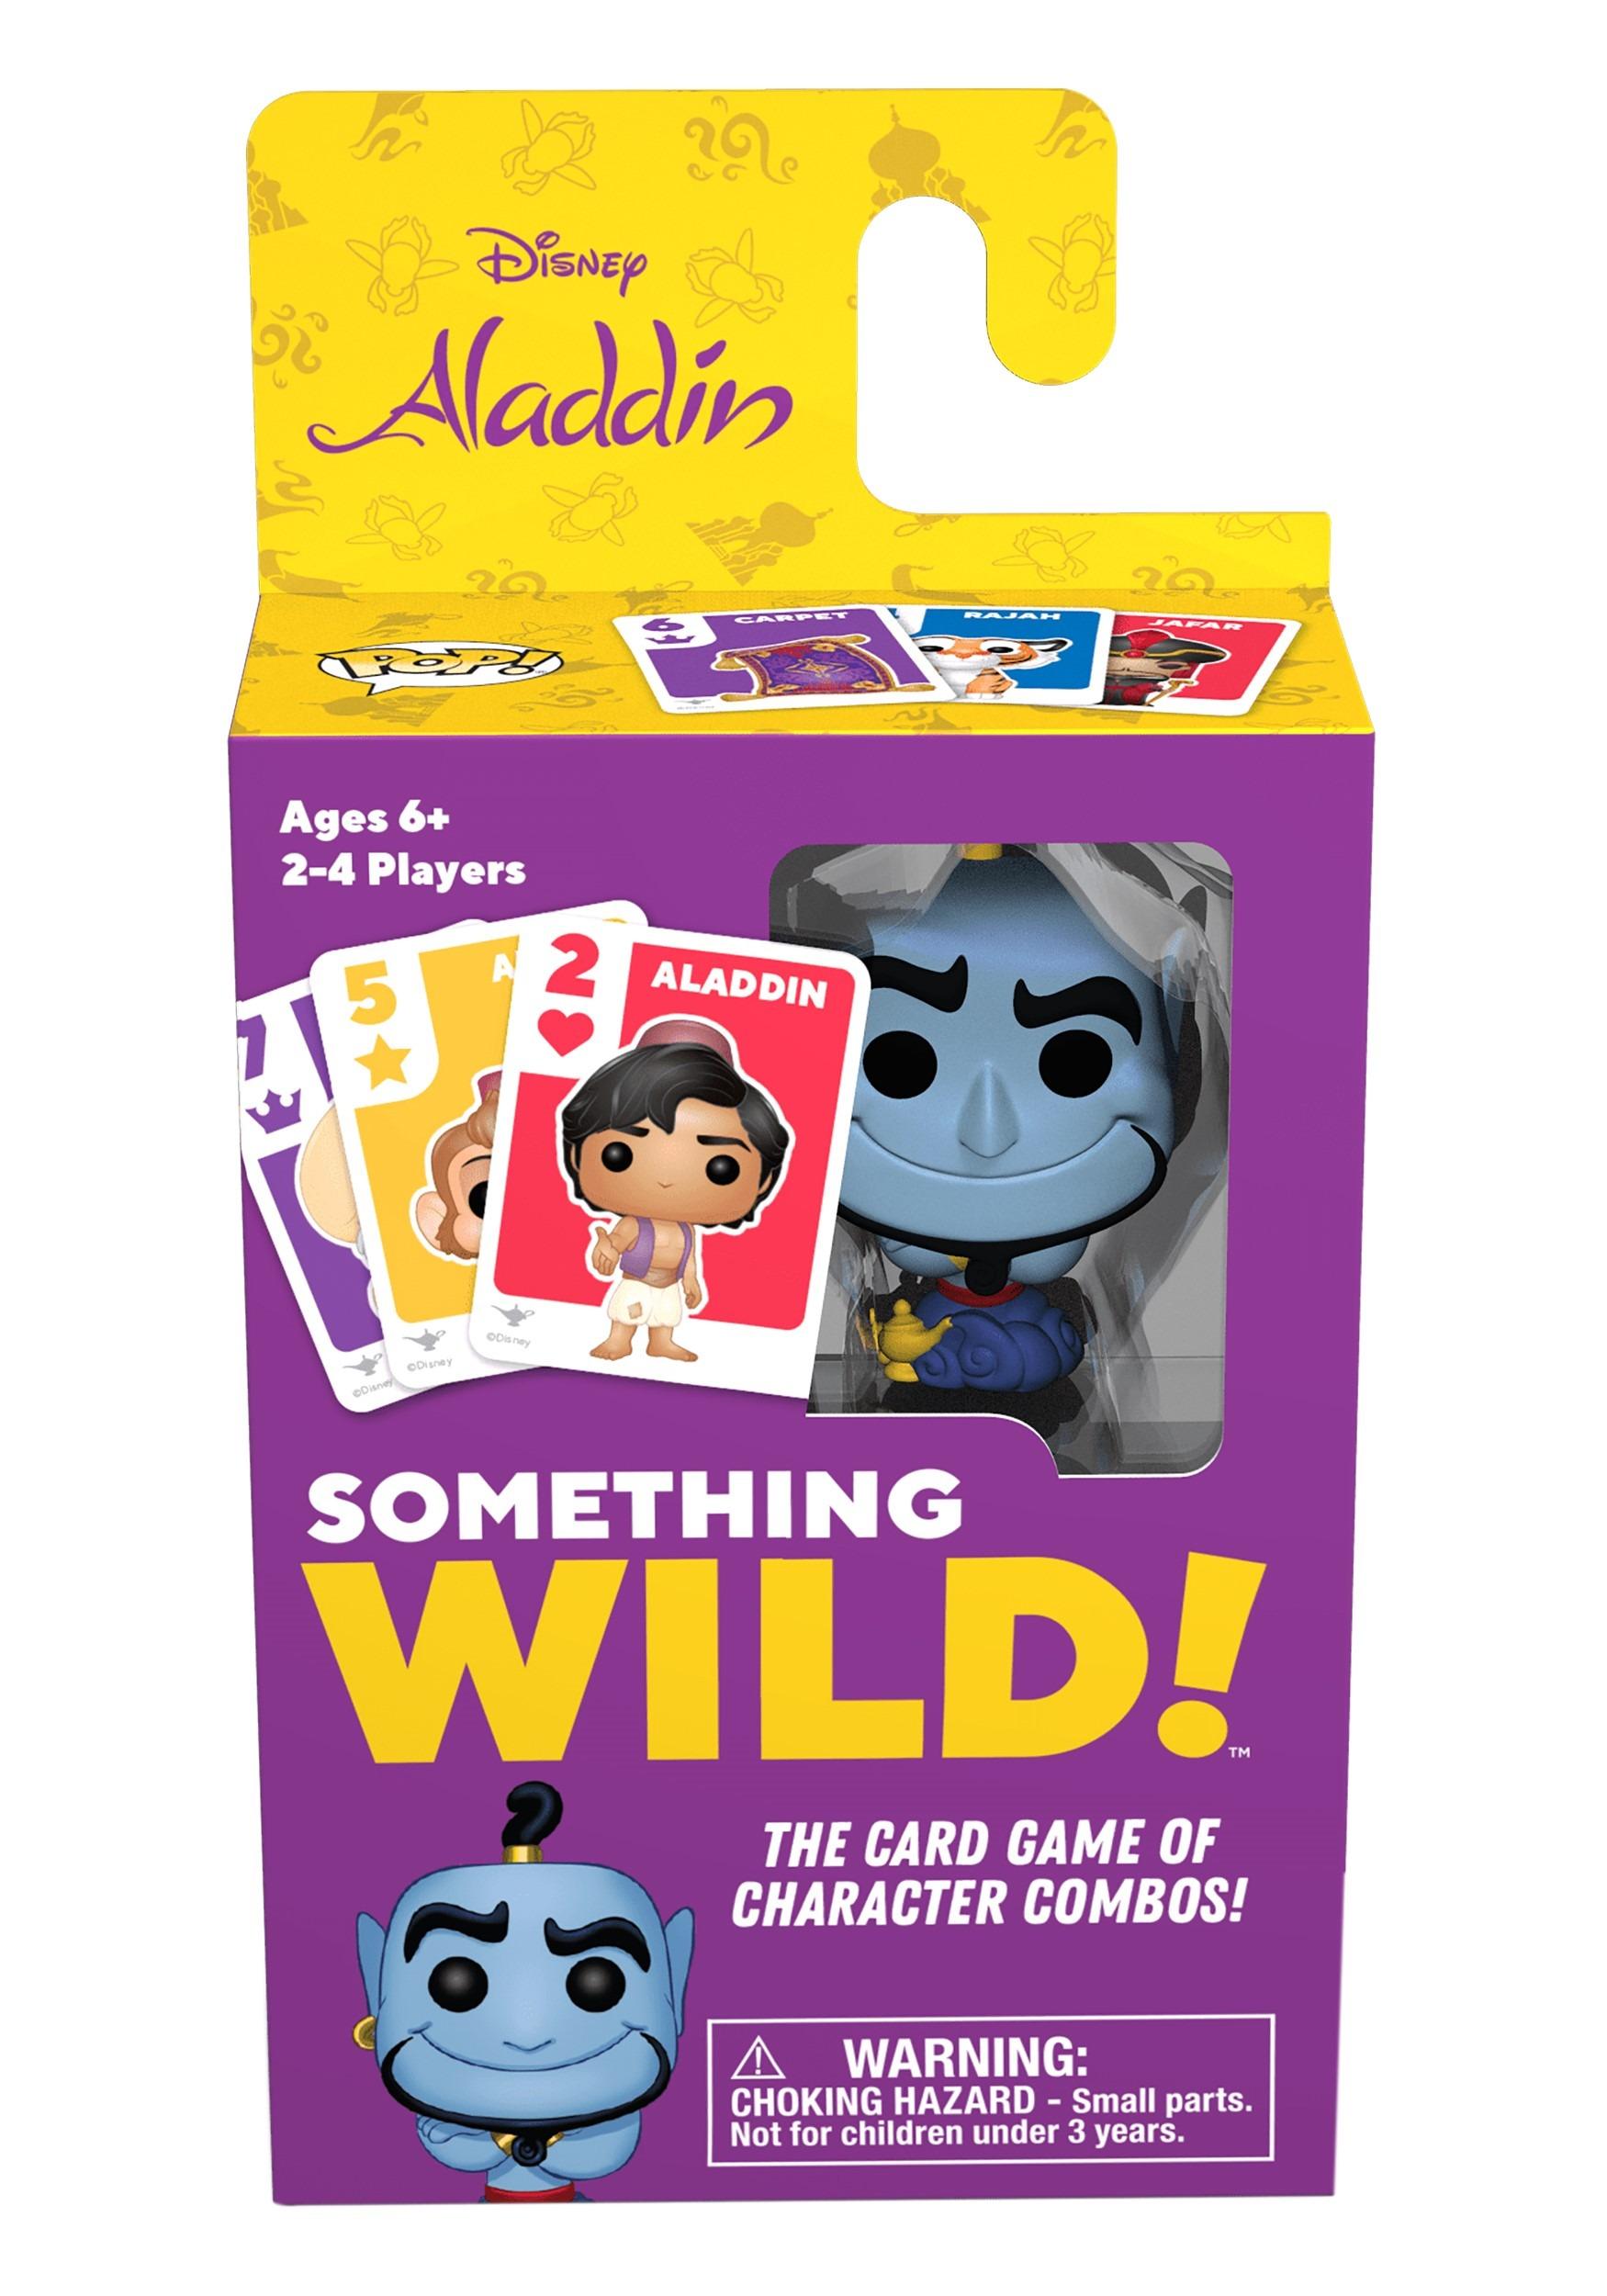 Signature Games: Aladdin - Something Wild Card Game